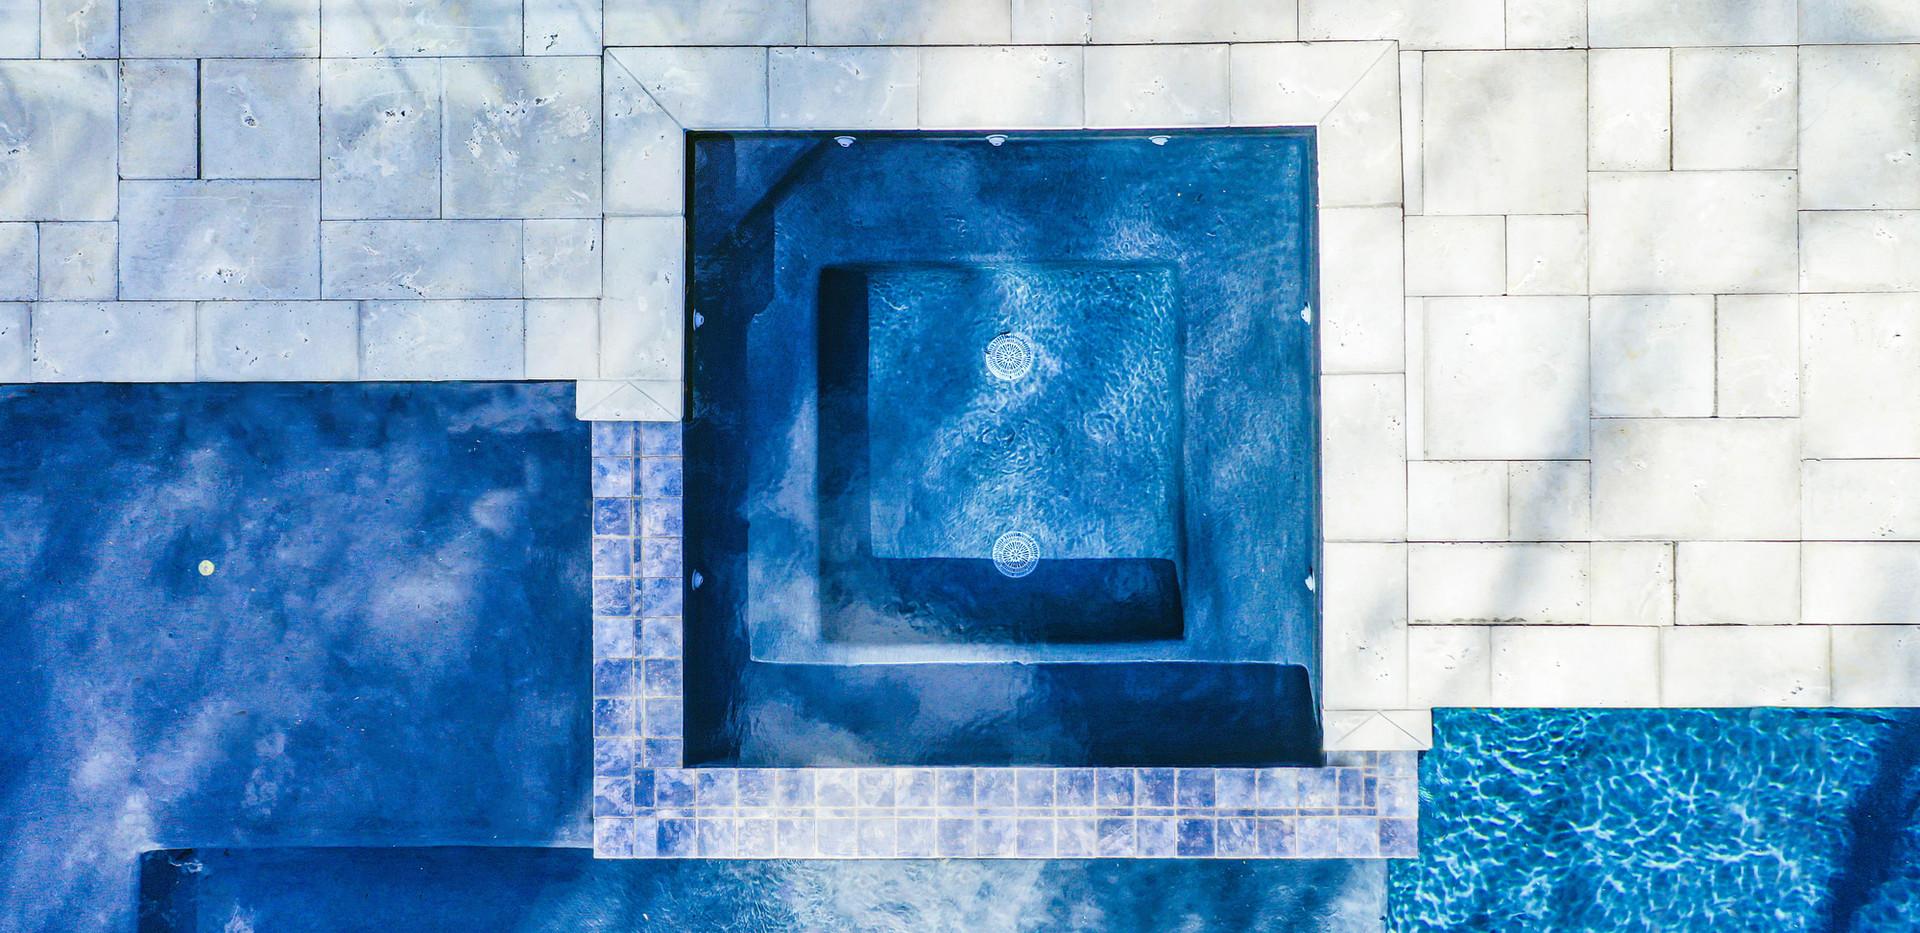 blue hot tub.jpg